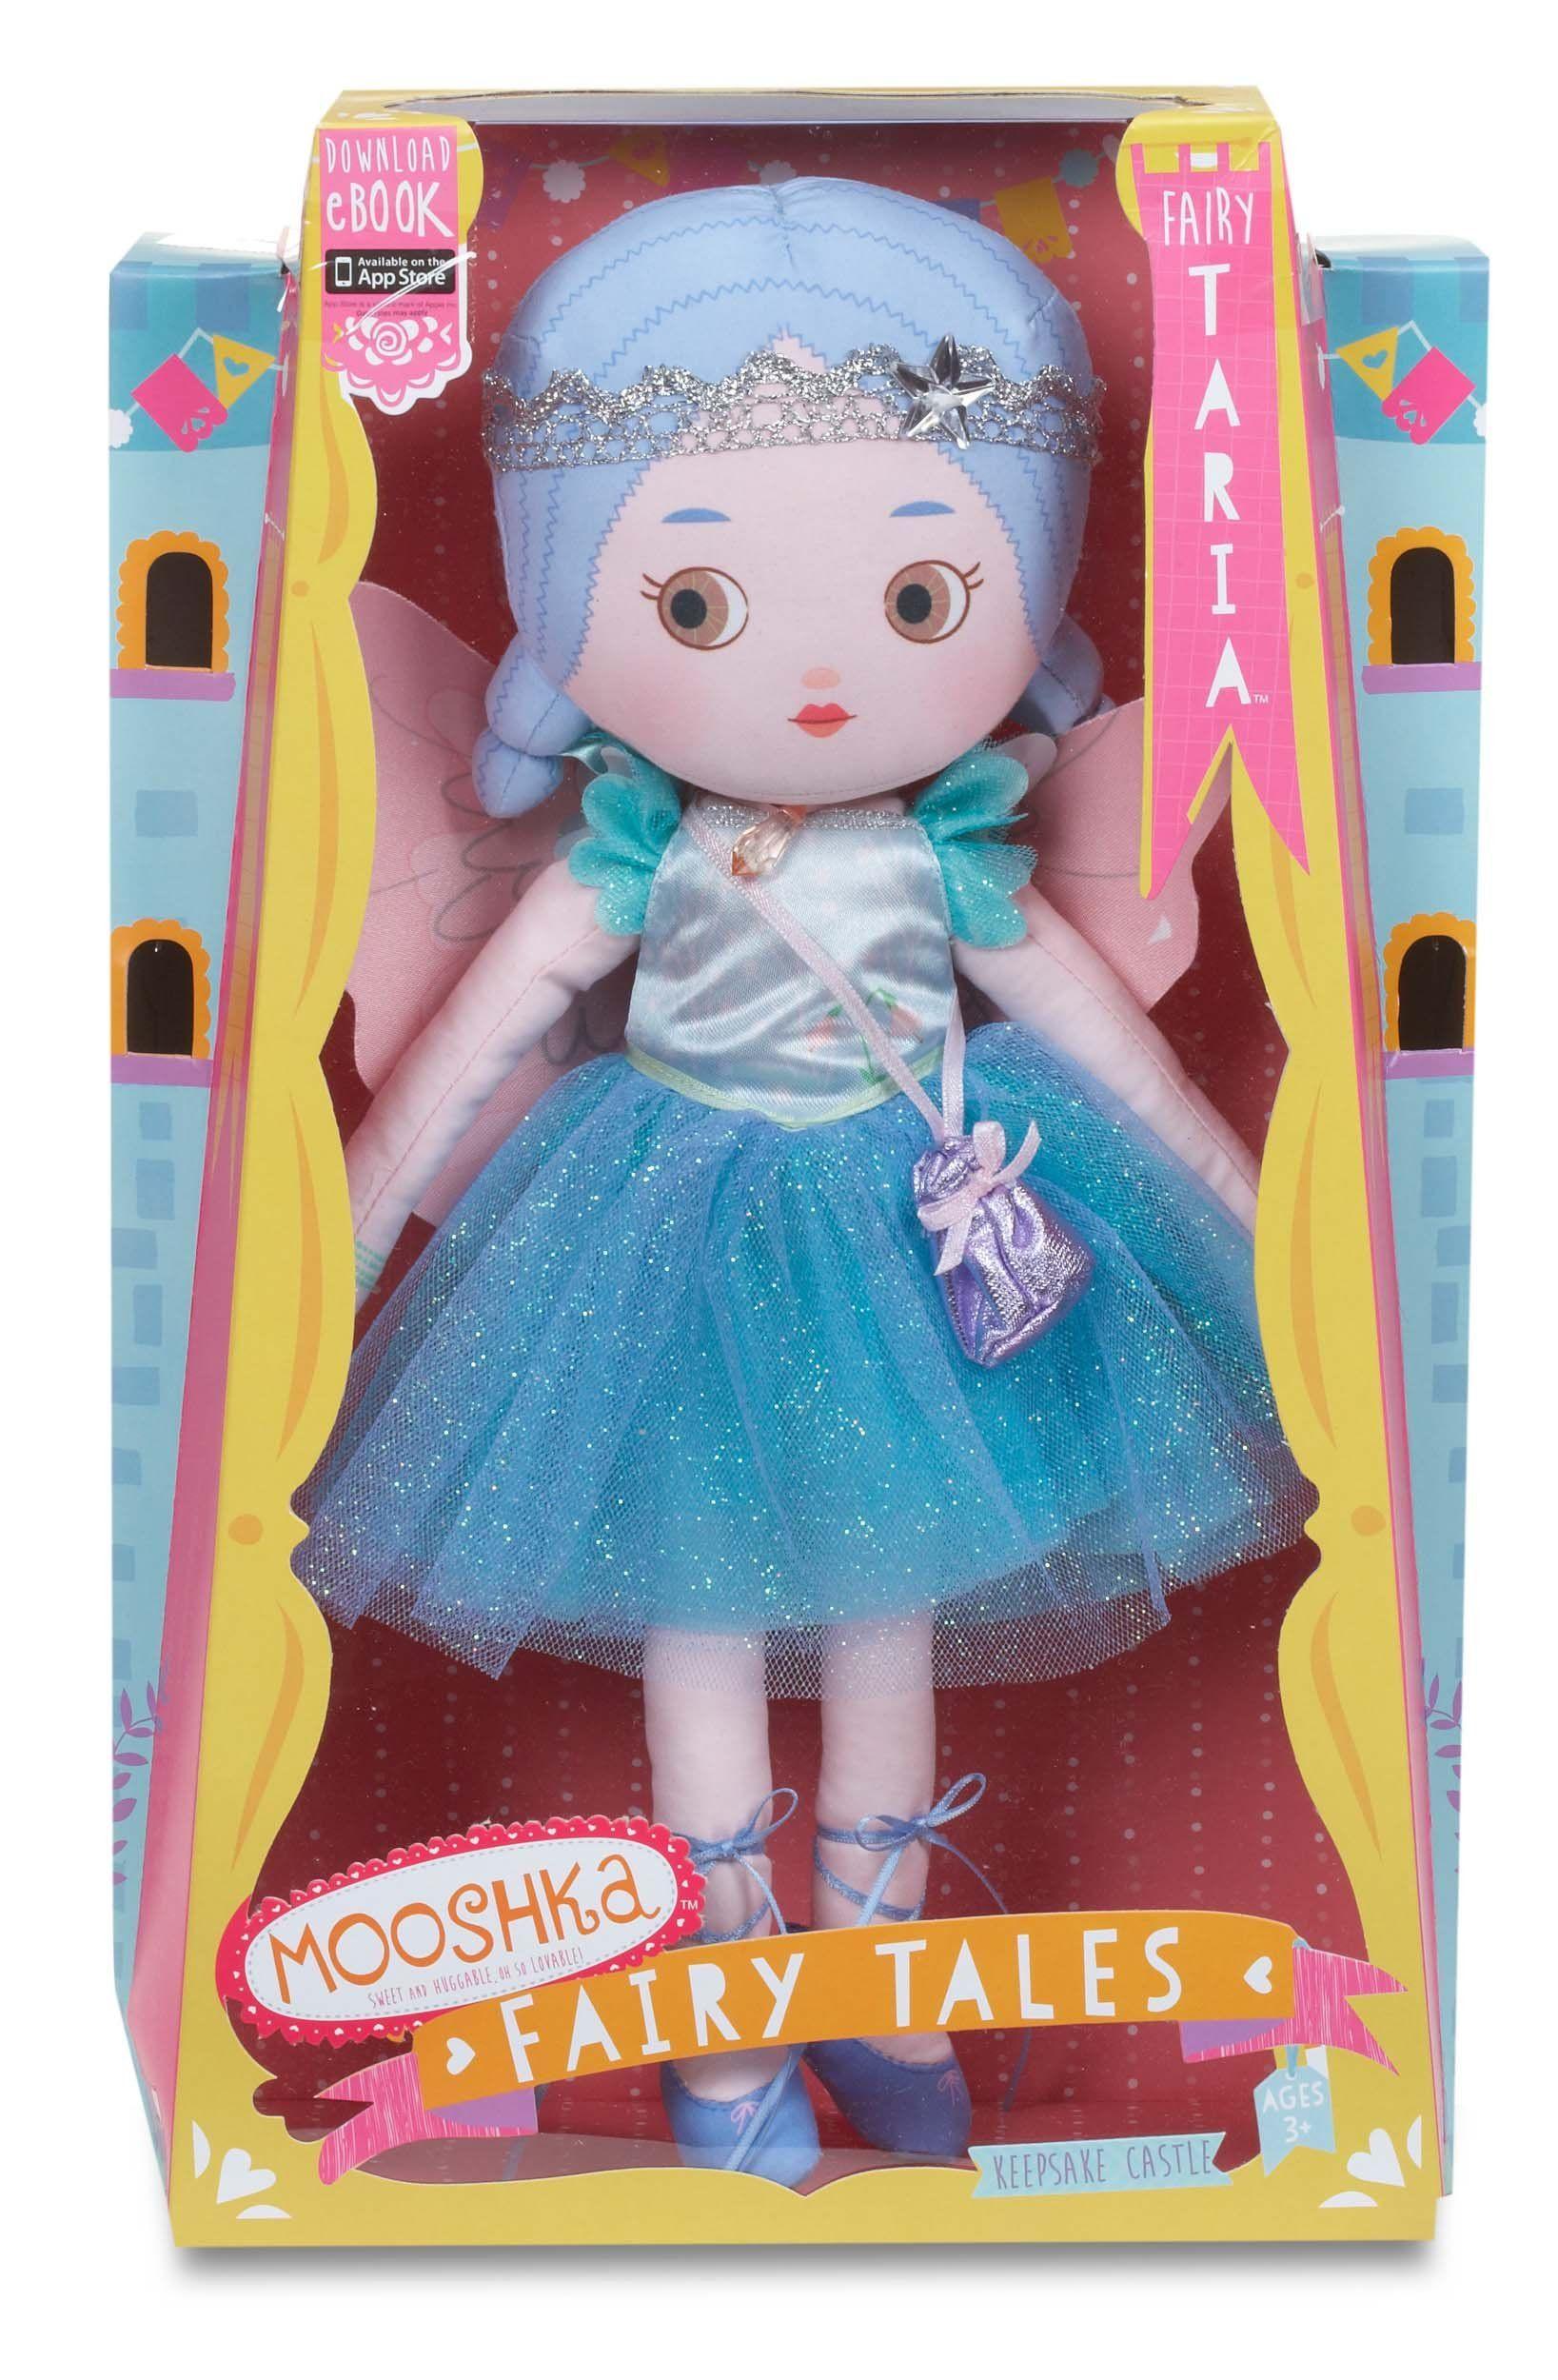 Amazoncom apps games - Amazon Com Mooshka Fairytales Girl Doll Fairy Taria Toys Games